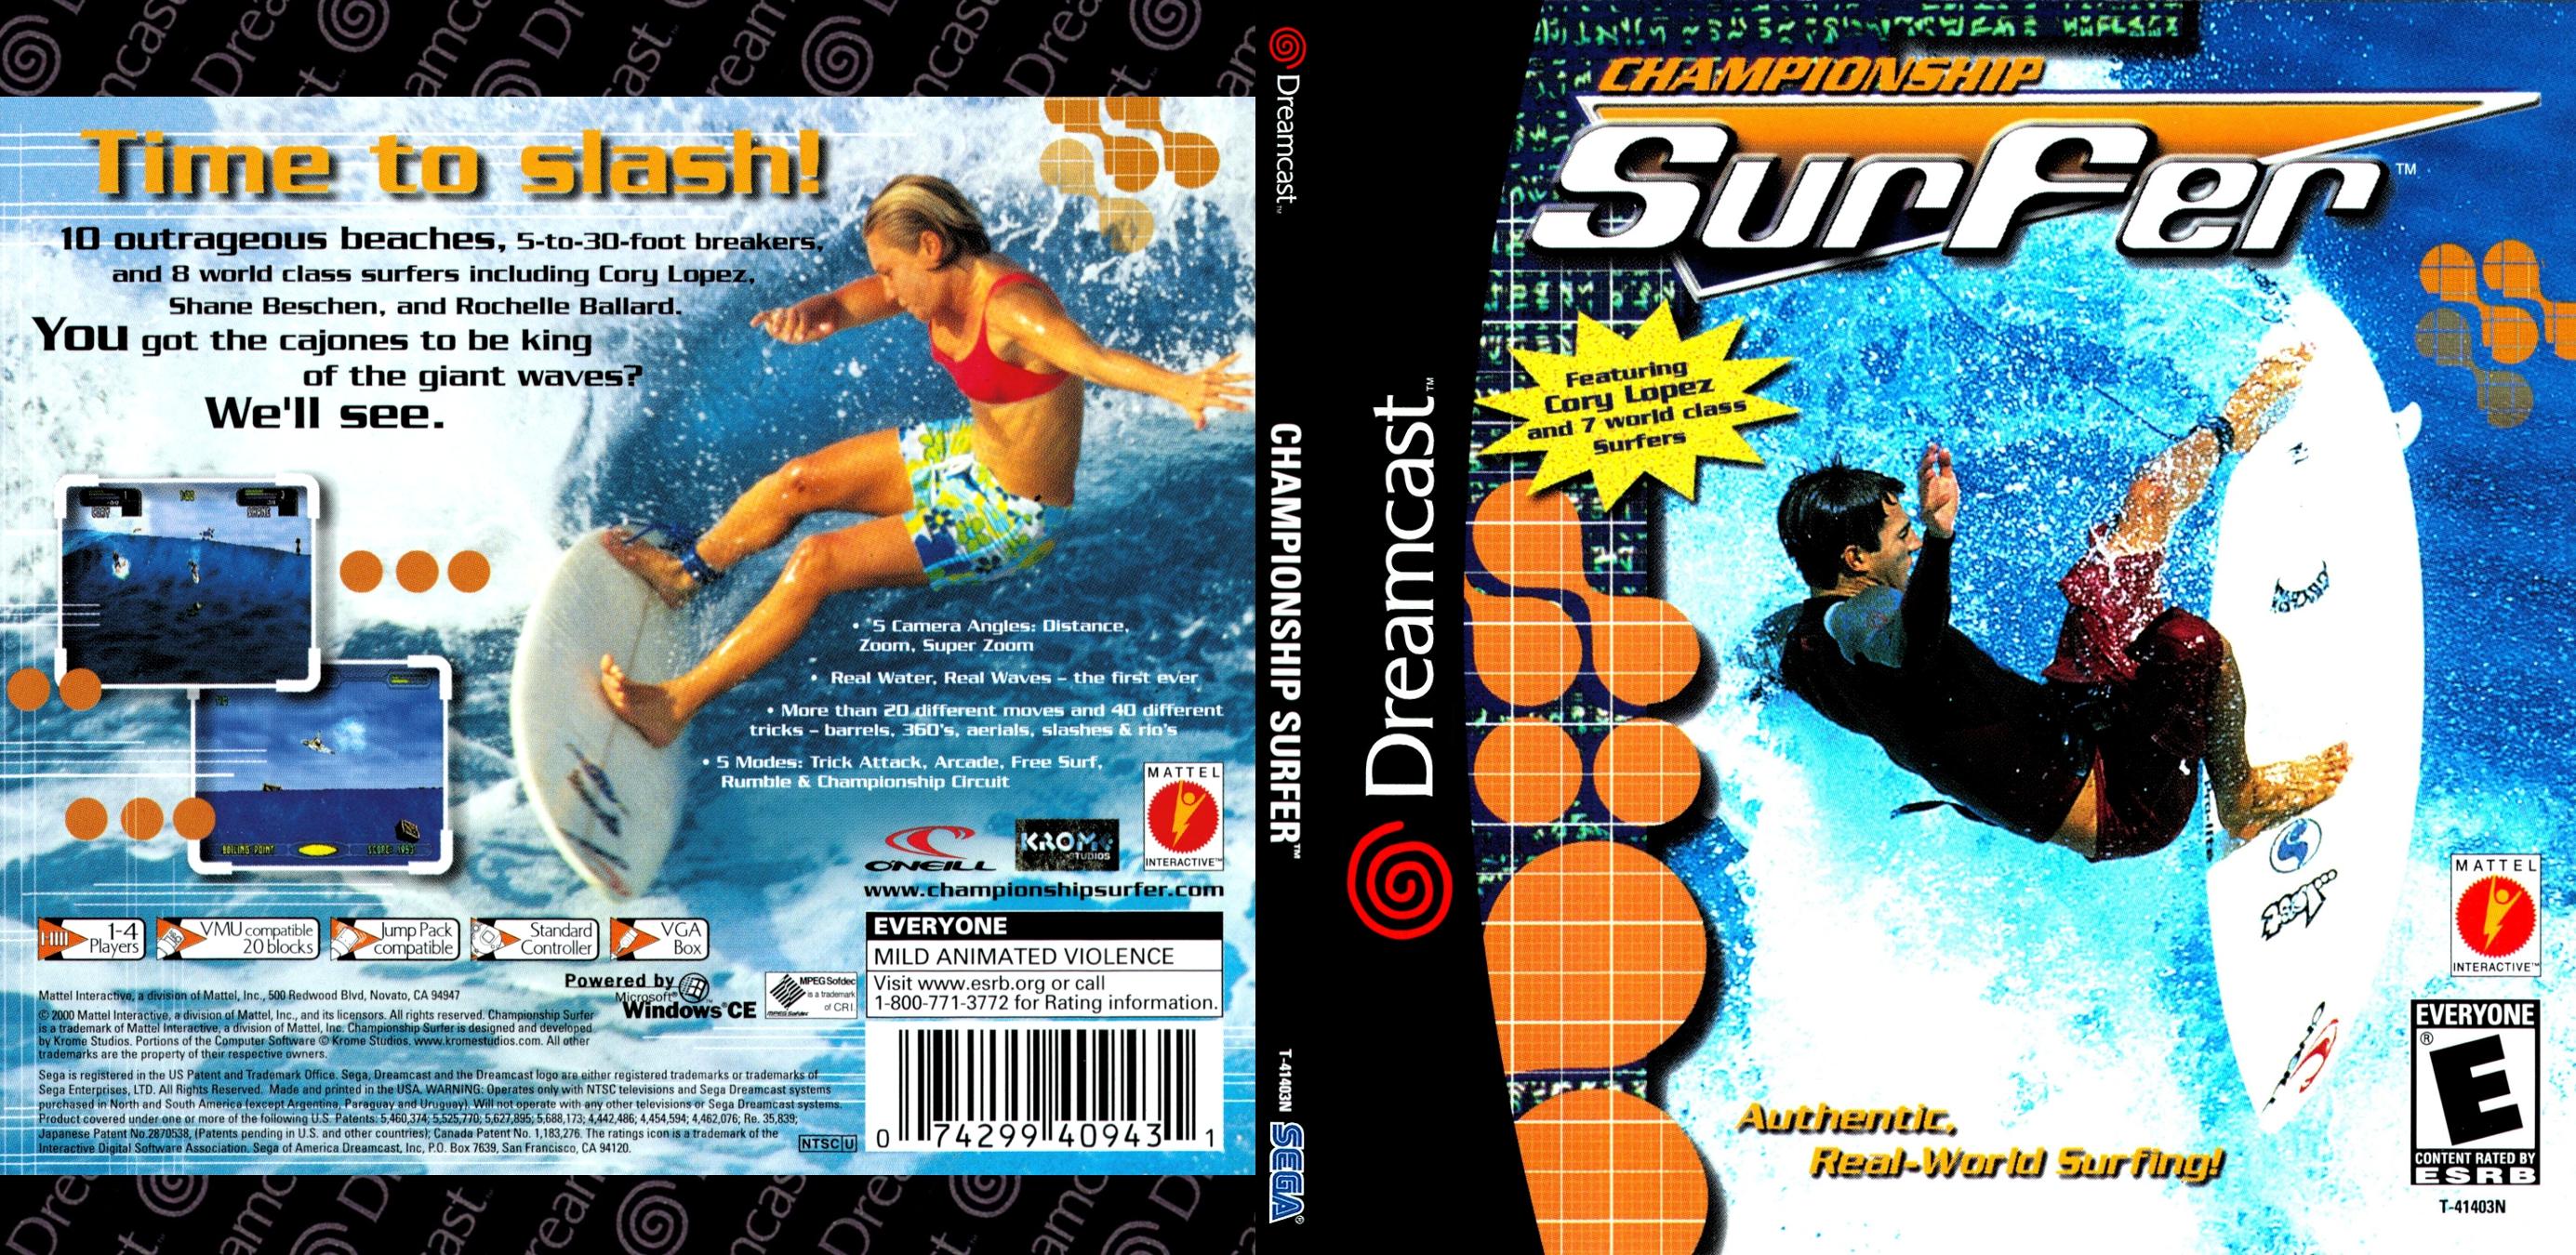 Championship Surfer ISO